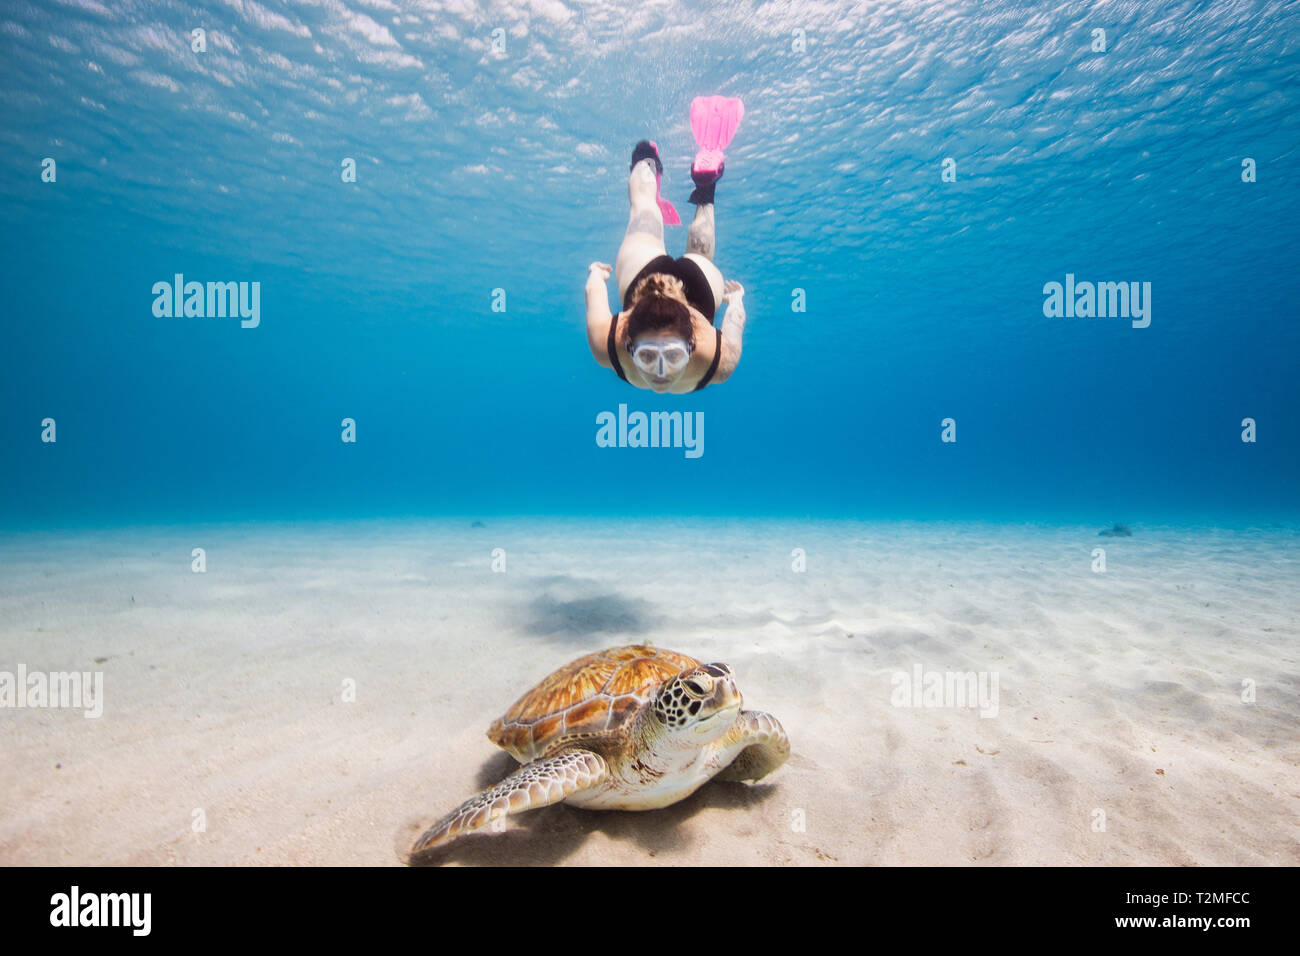 Woman swimming towards green sea turtle, Curacao - Stock Image